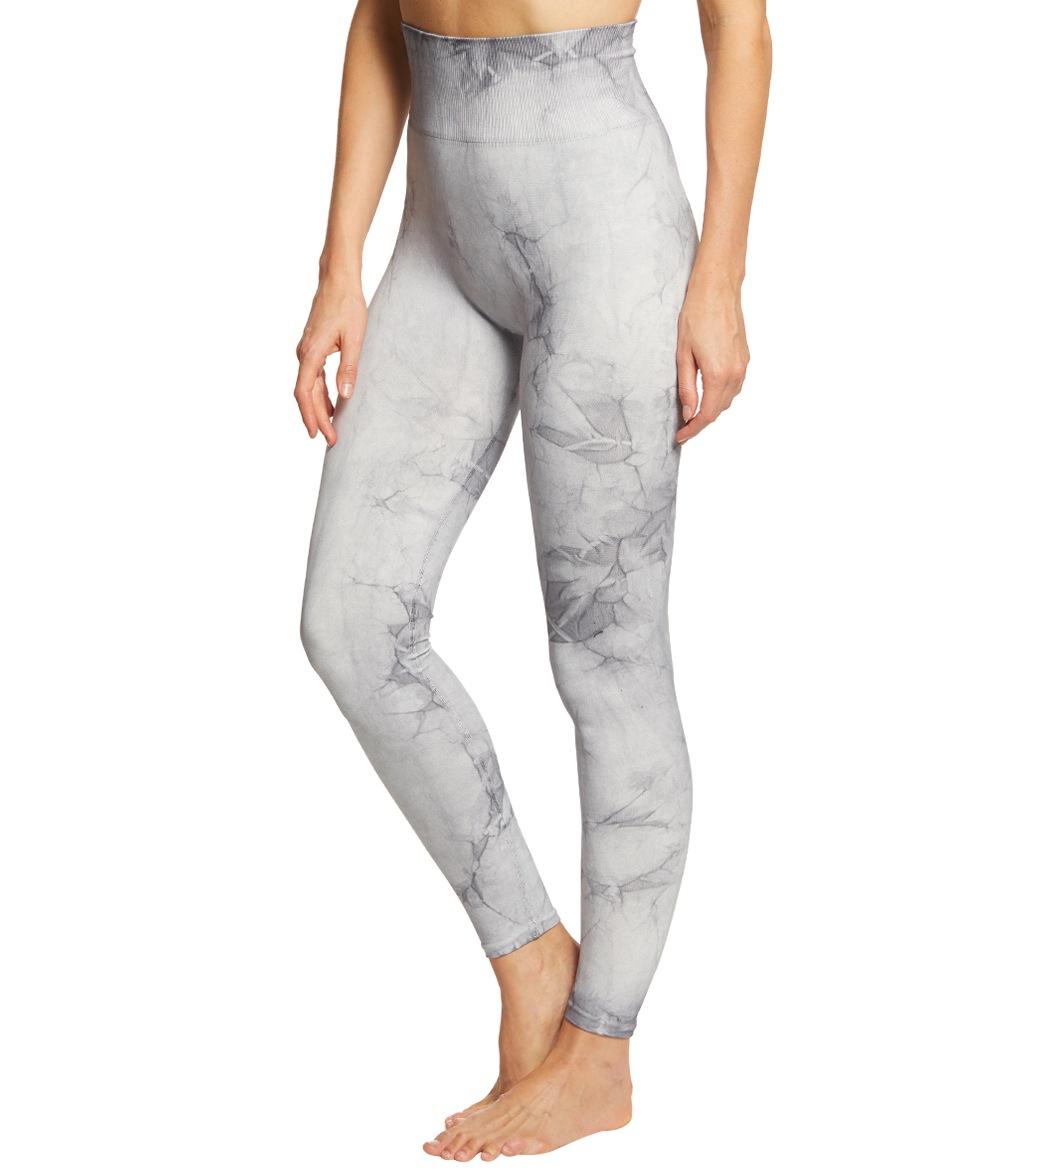 c4a5940fe4 Spiritual Gangster Seamless Tie Dye Yoga Leggings at YogaOutlet.com ...